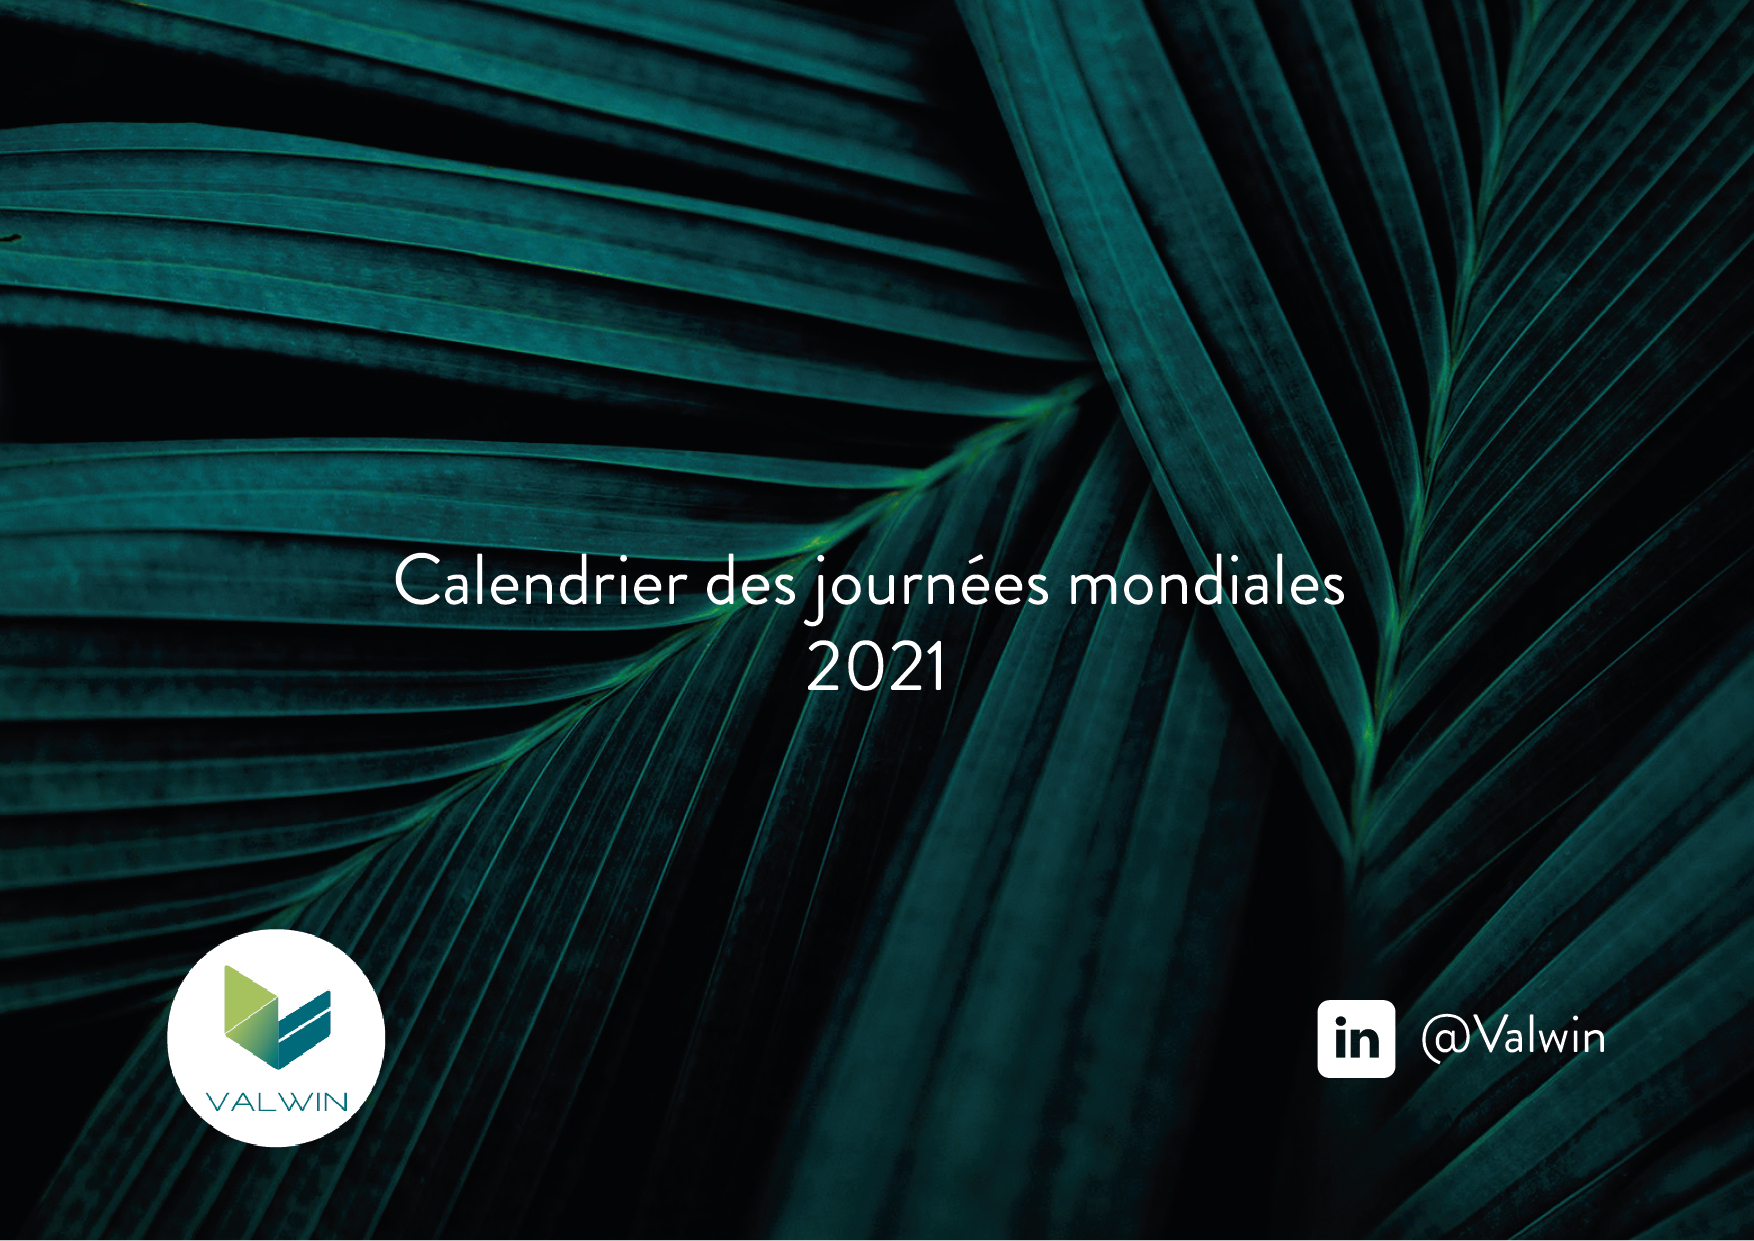 calendrier-liste-journee-mondiale-sante-2021.jpg